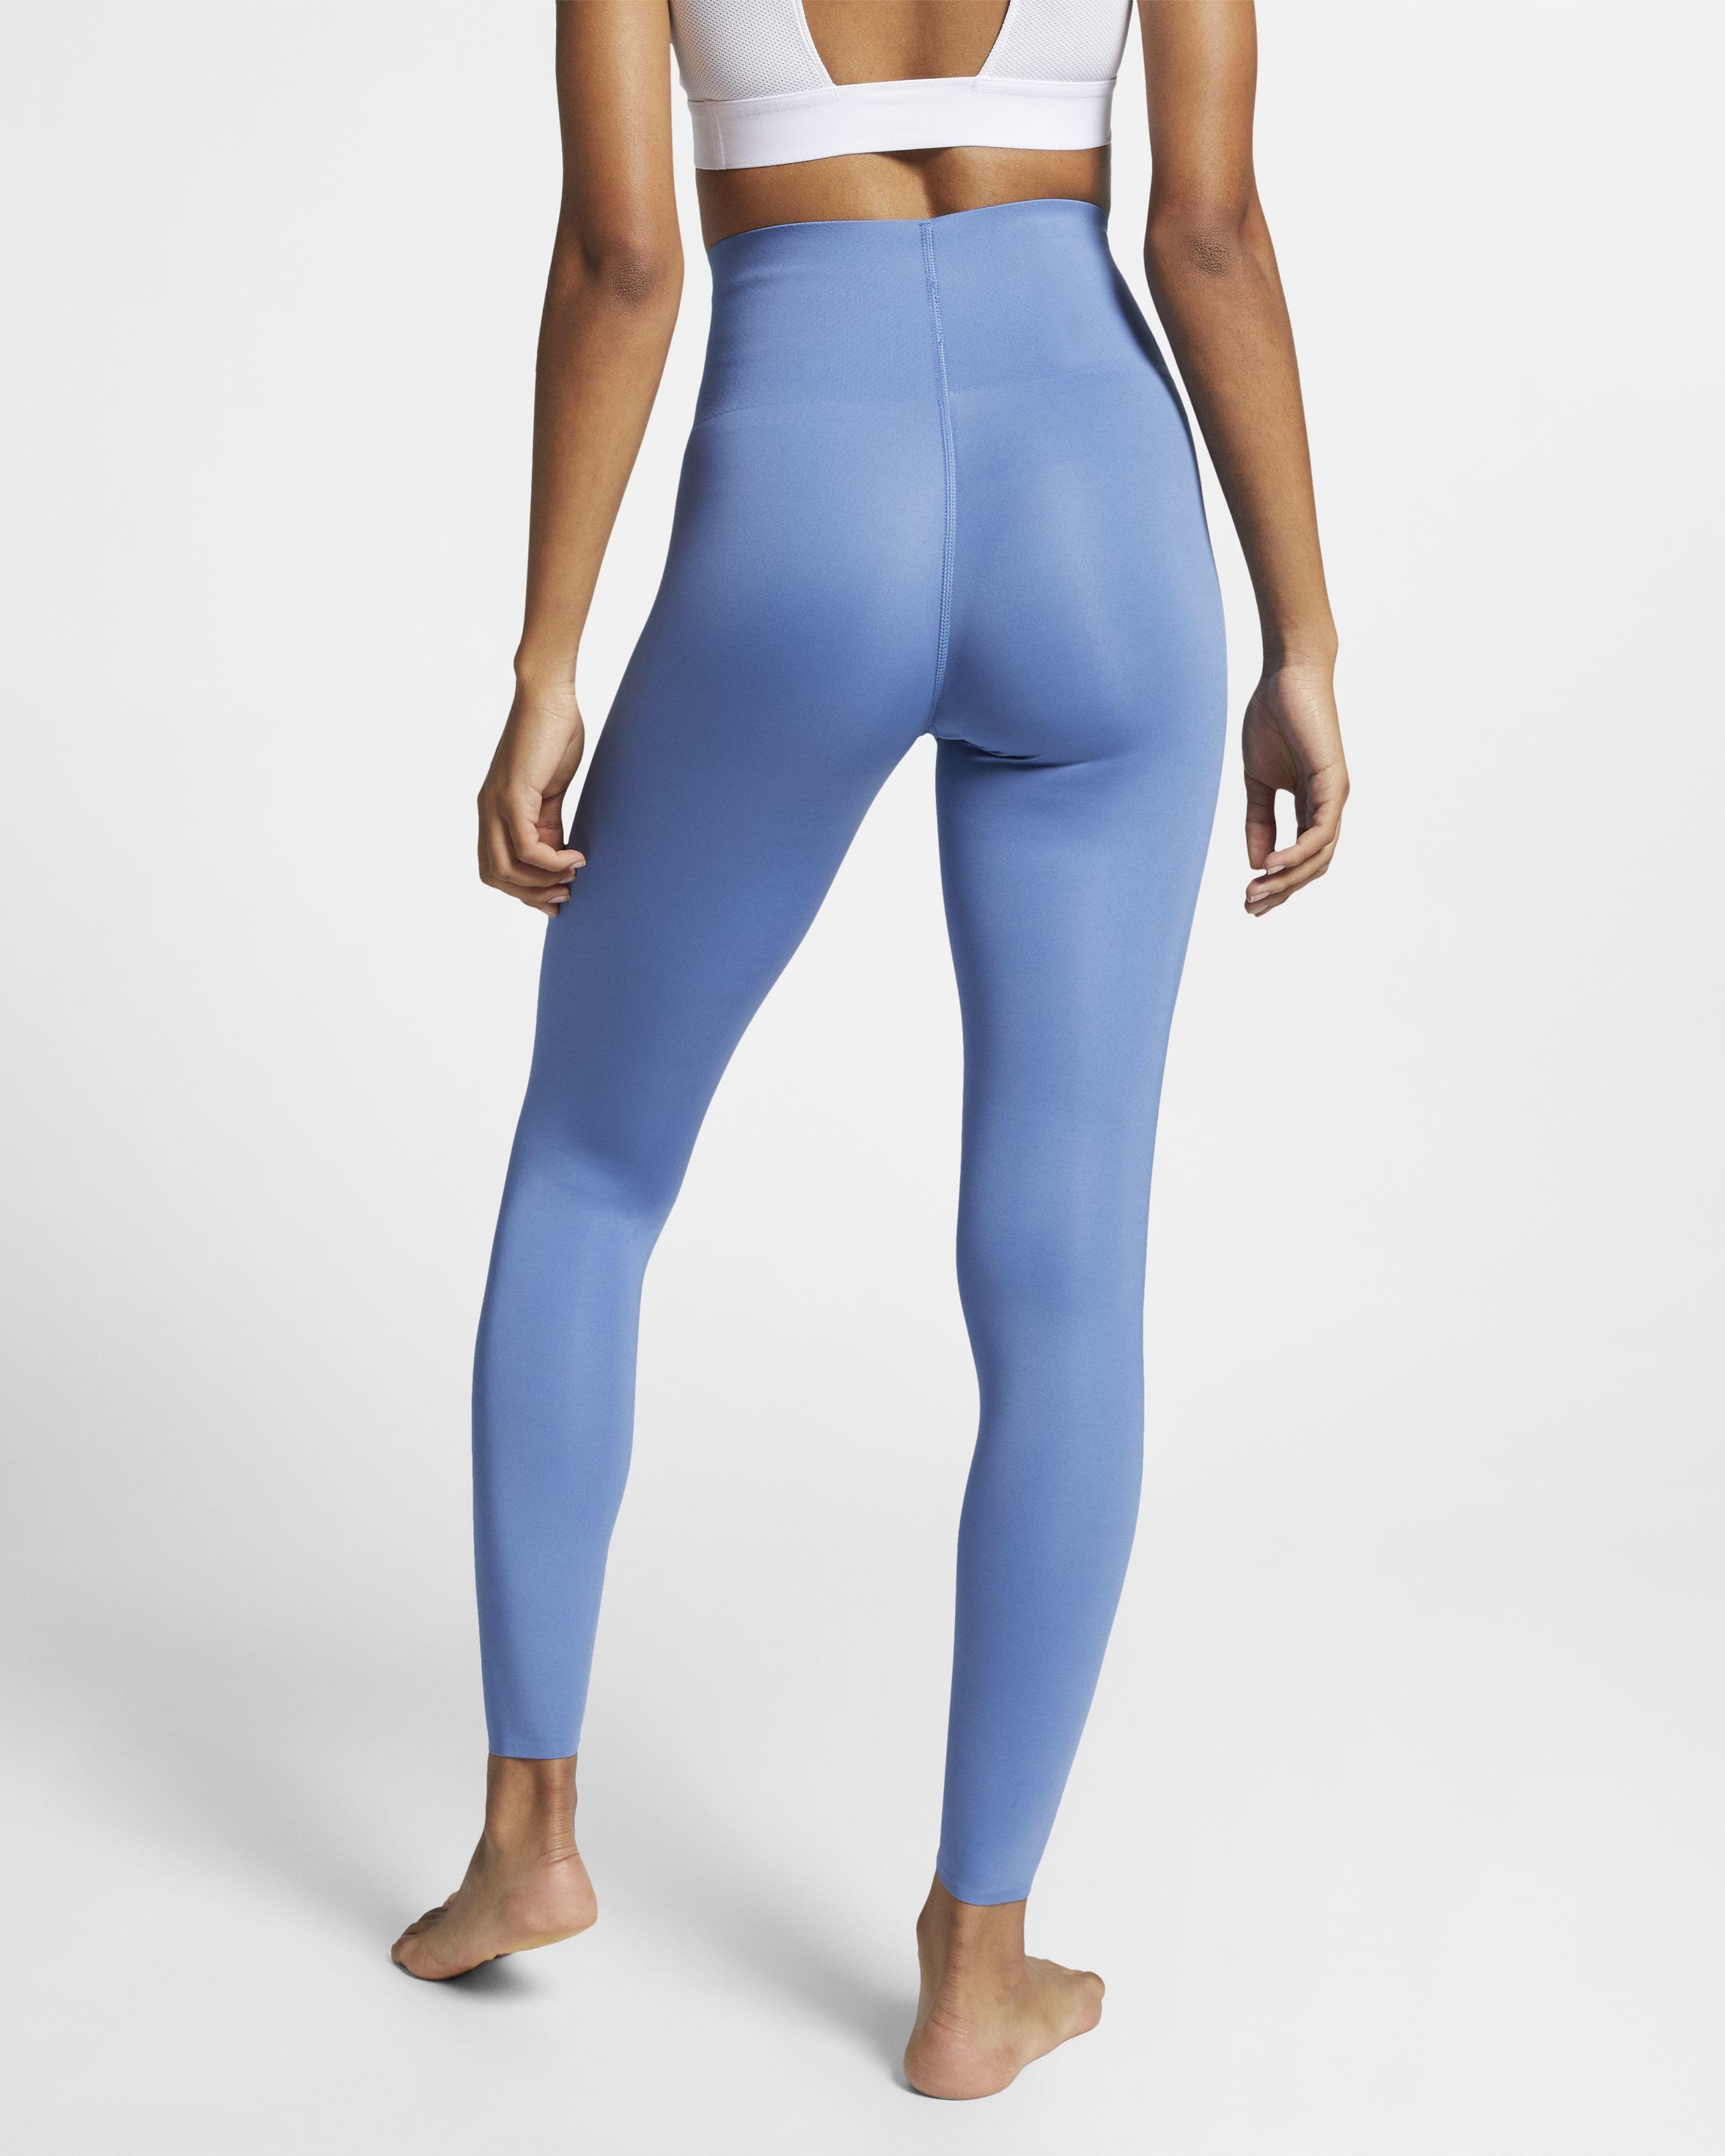 Yoga Leggings Brands Logos : leggings, brands, logos, Leggings, Brands, Every, Workout